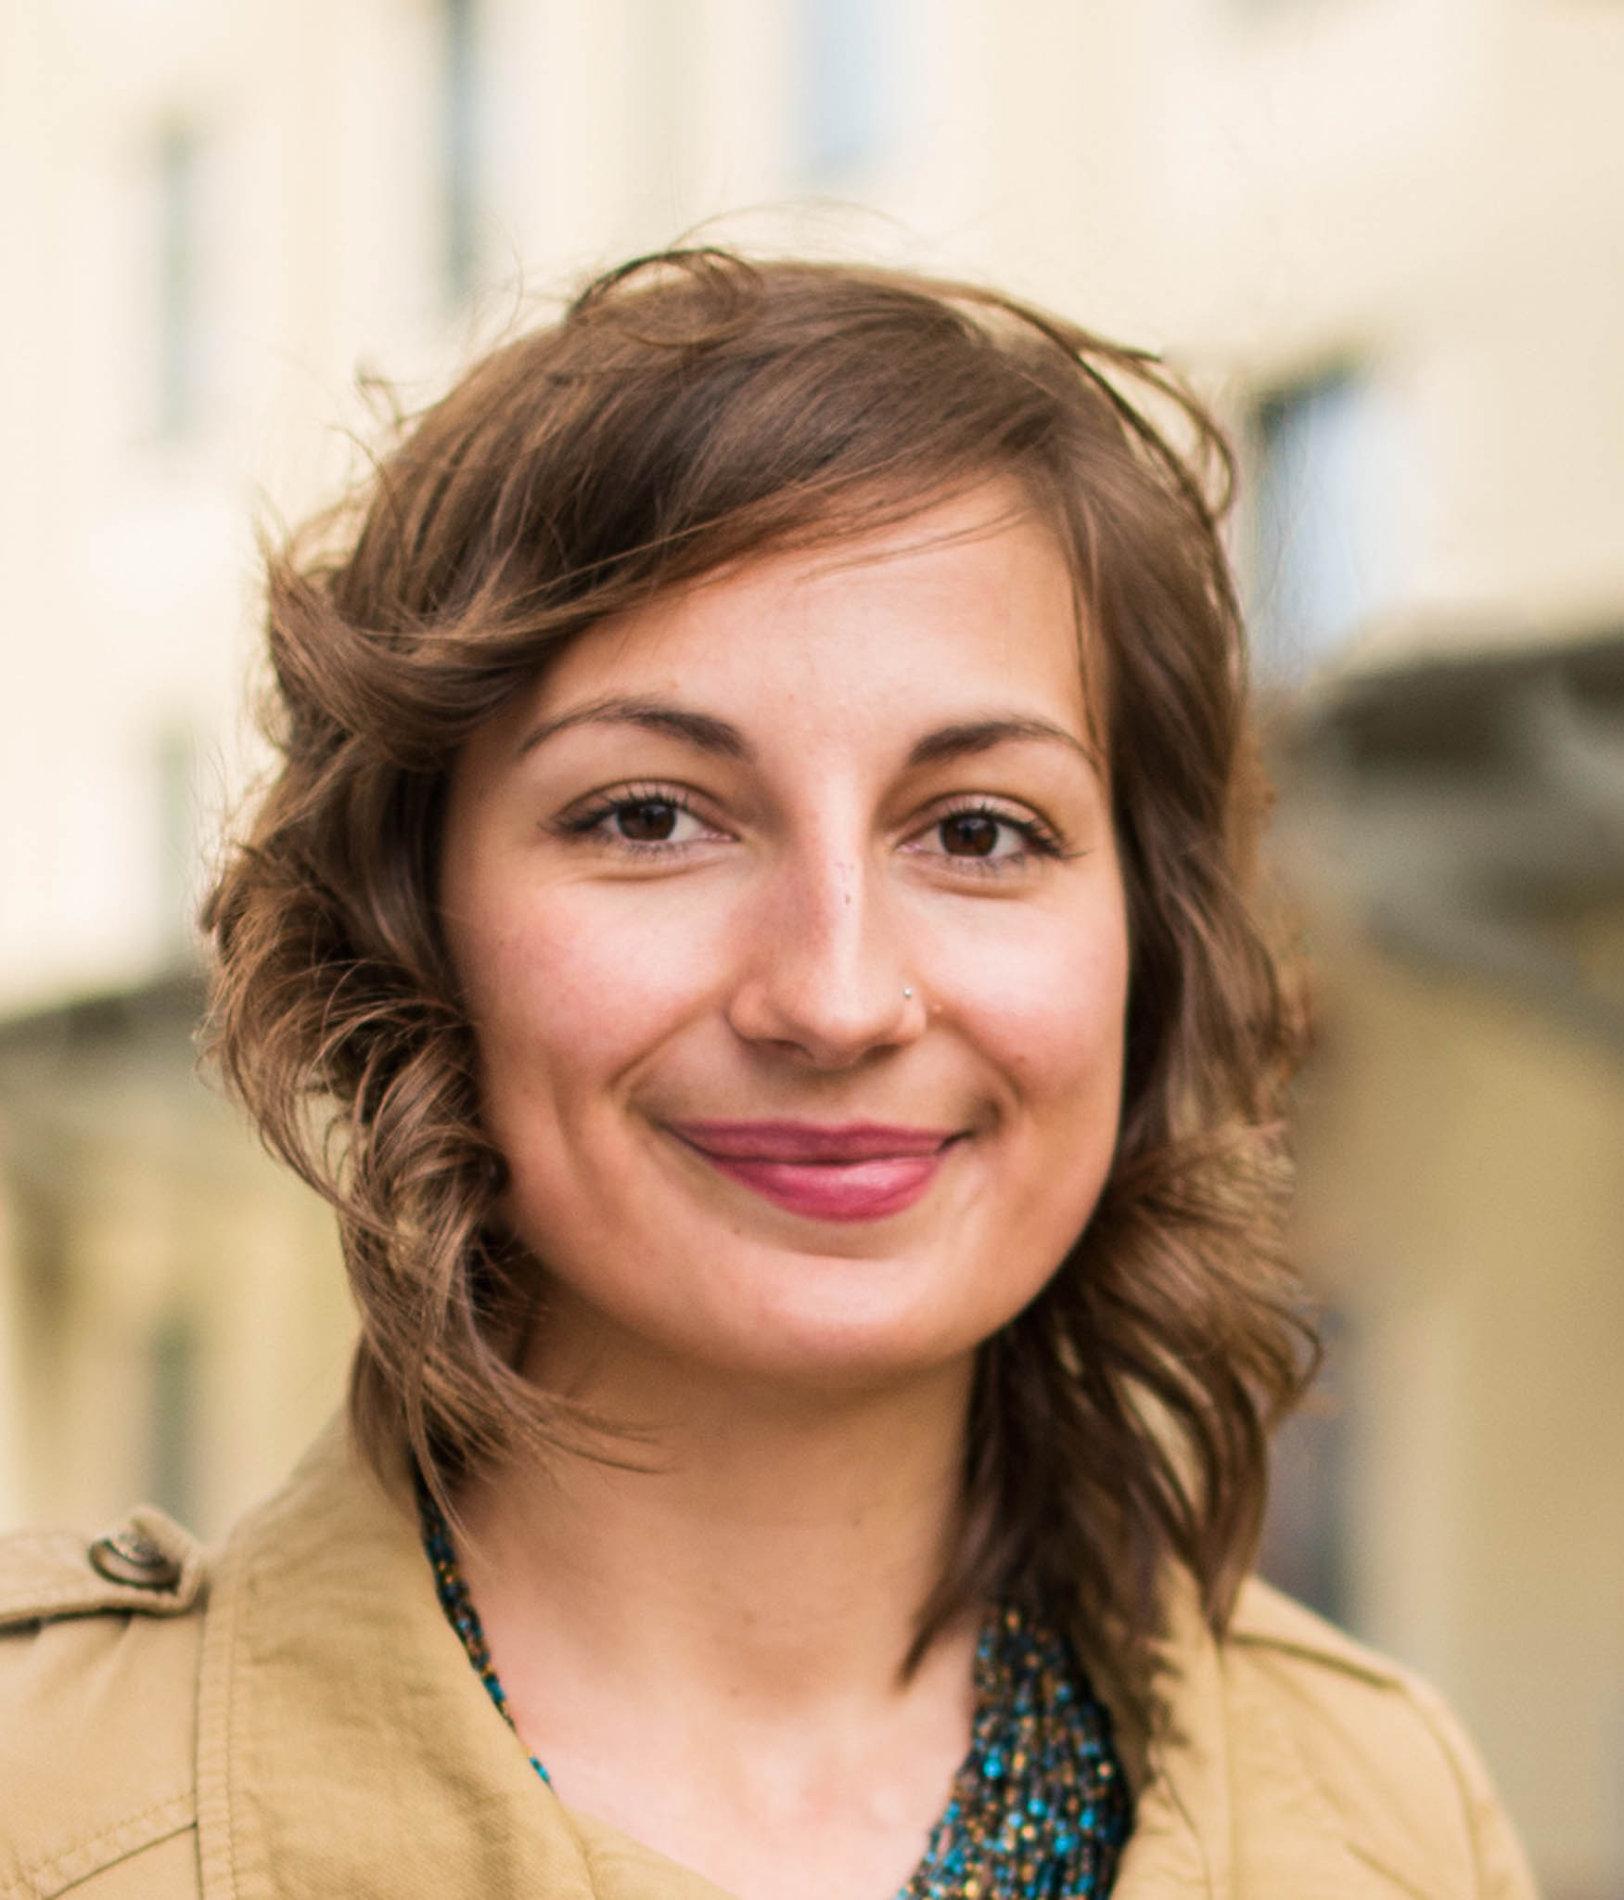 Kristýna Pilná, marketingová manažerka firmy Etnetera